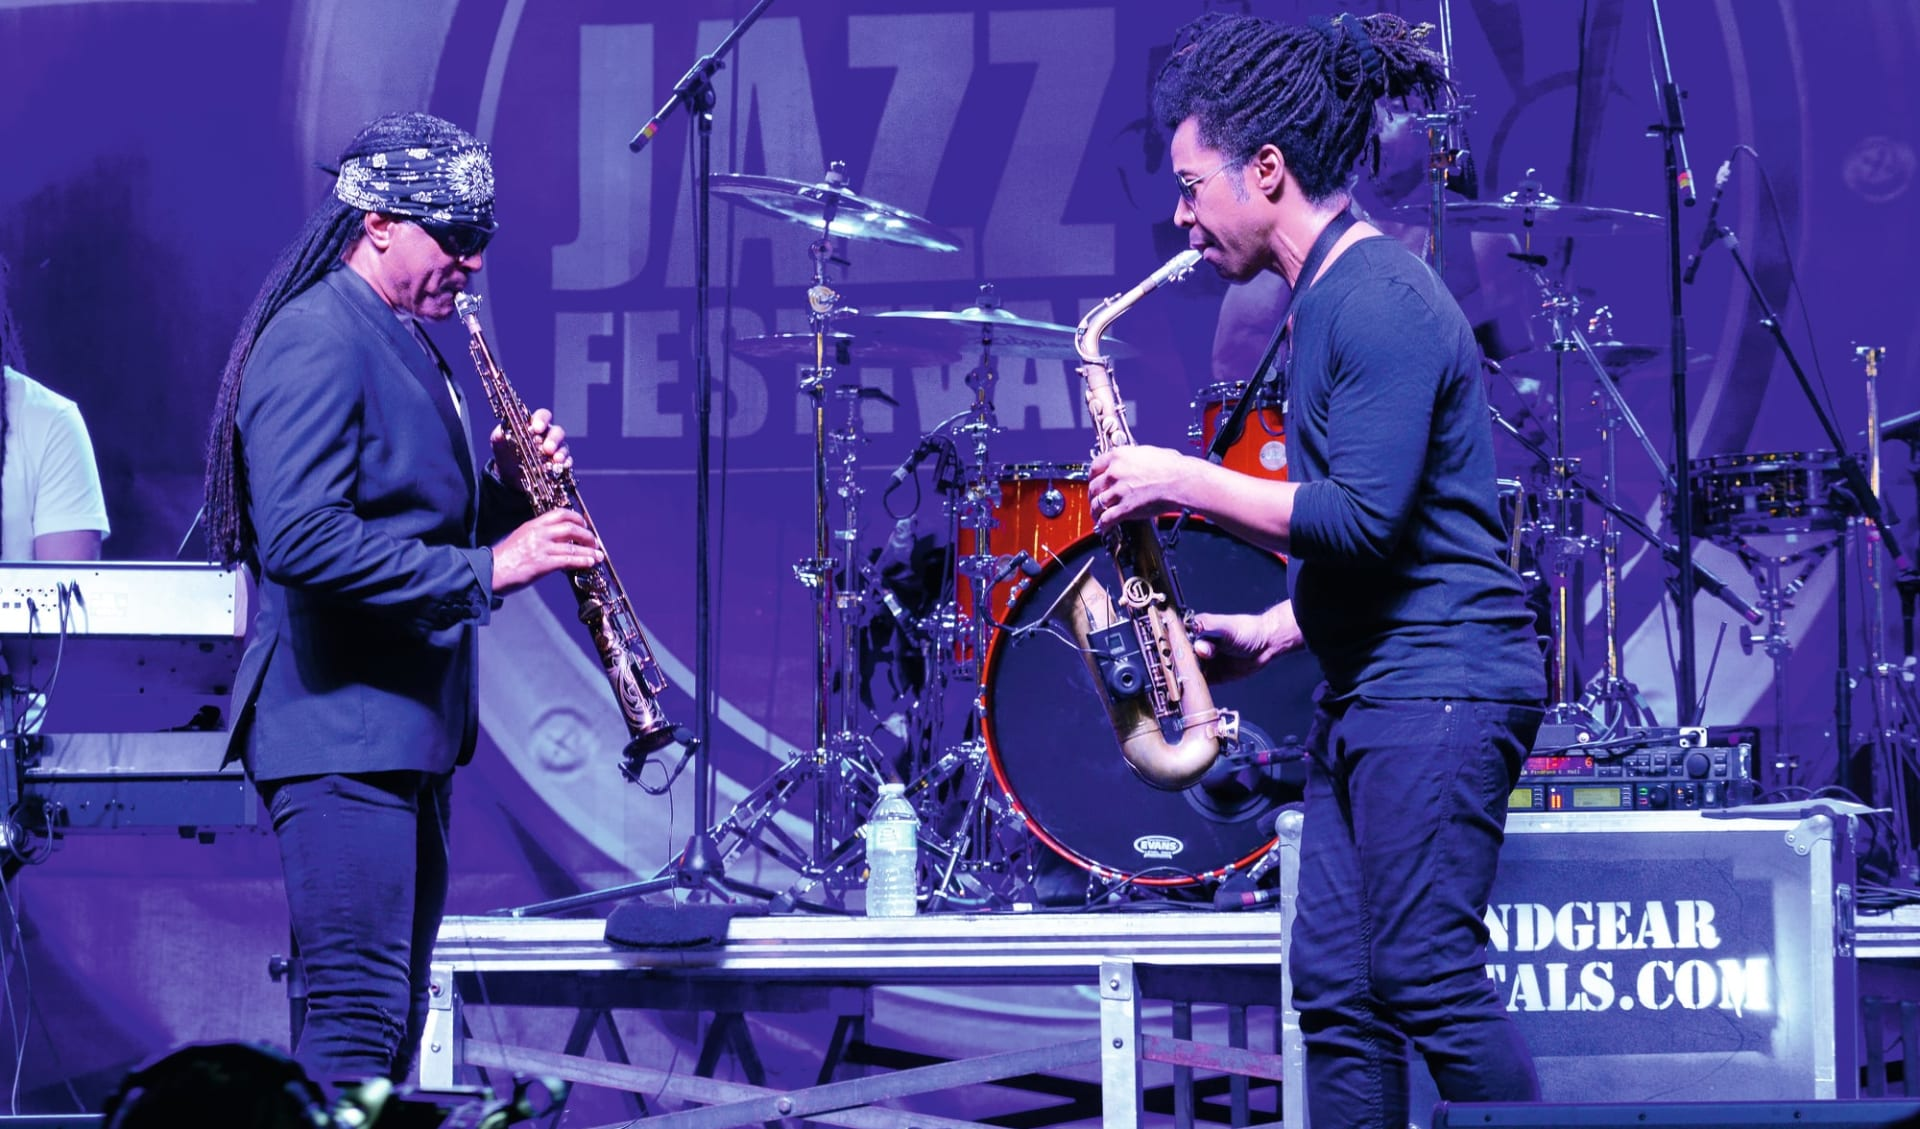 Music and Bourbon ab Nashville: Jazz Musiker Birmingham